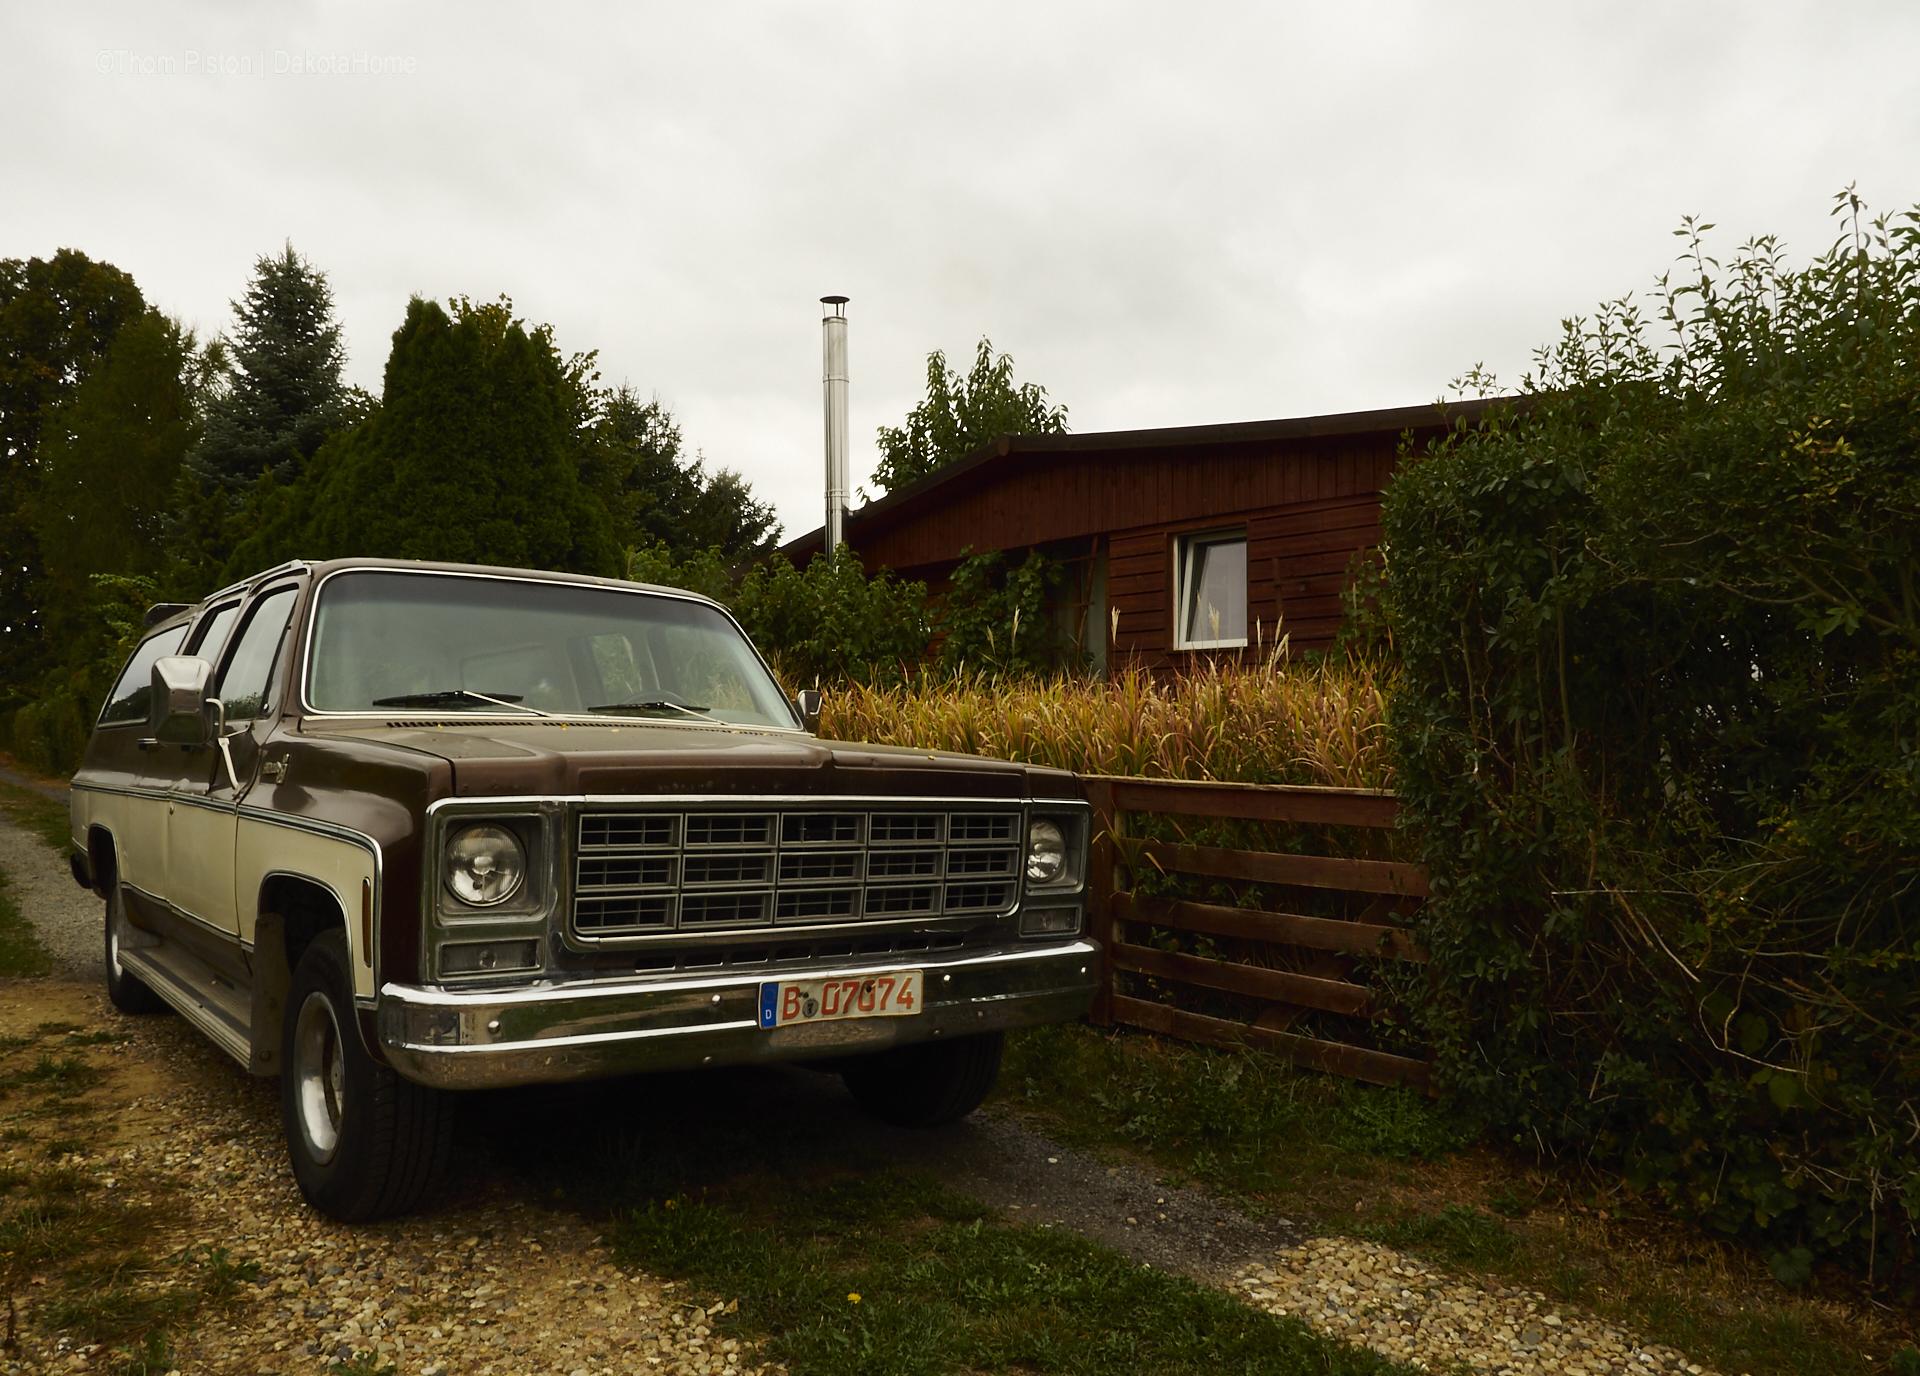 Chevy Suburban, Dakota Home Transporter